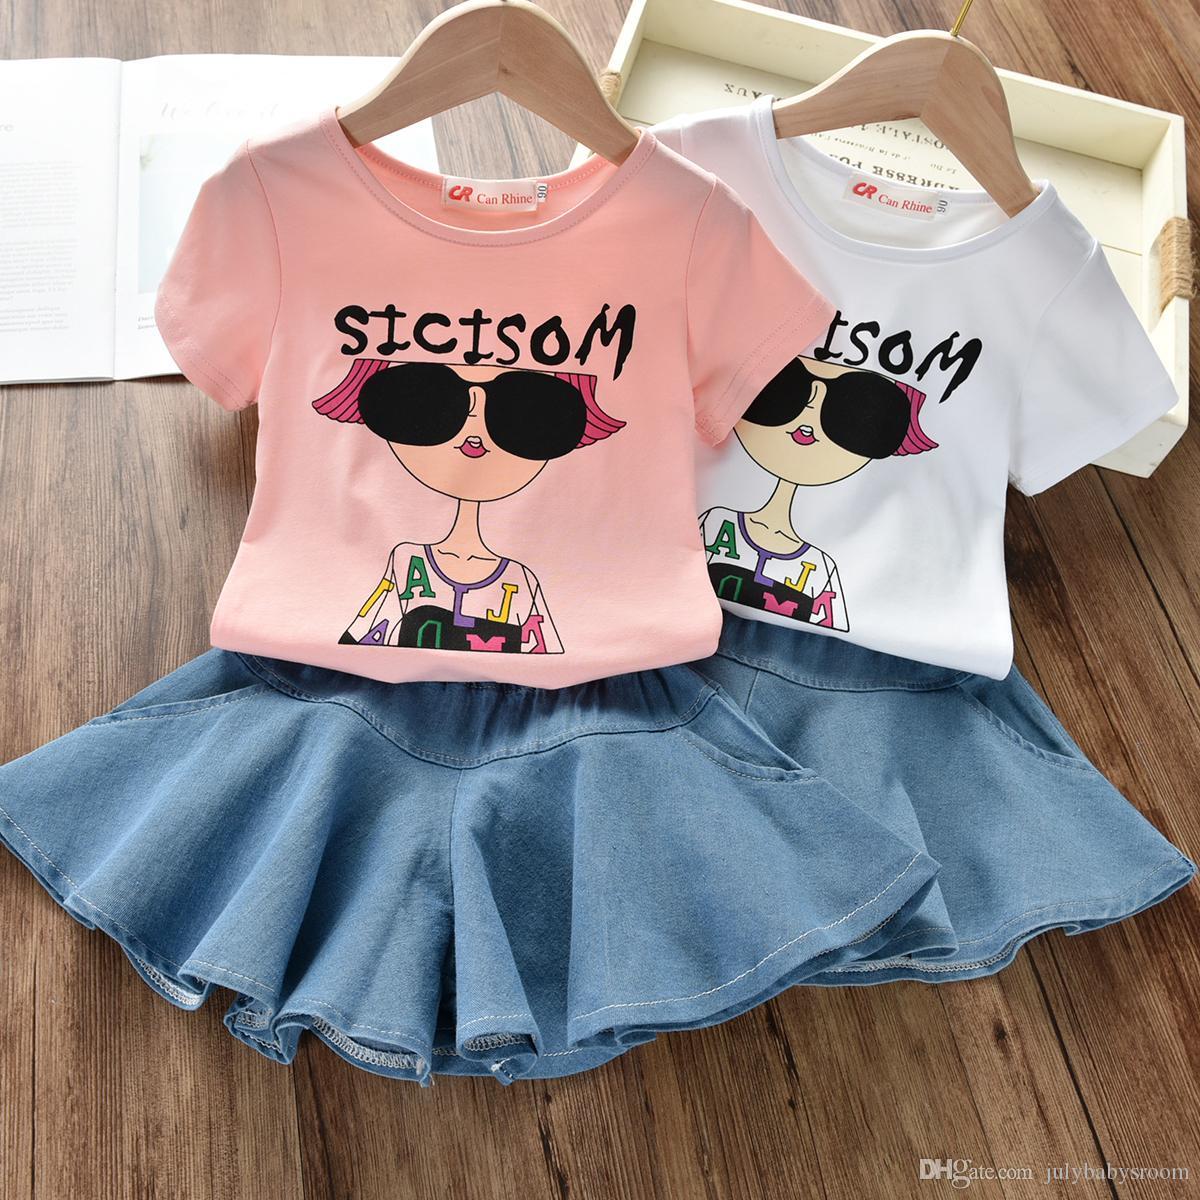 New 2PCS Toddler Kids Girl Clothes Set Summer Short Sleeve Cool Girl T-shirt Tops Skirt Outfit Child Suit New Denim skirt +t-shirt suit